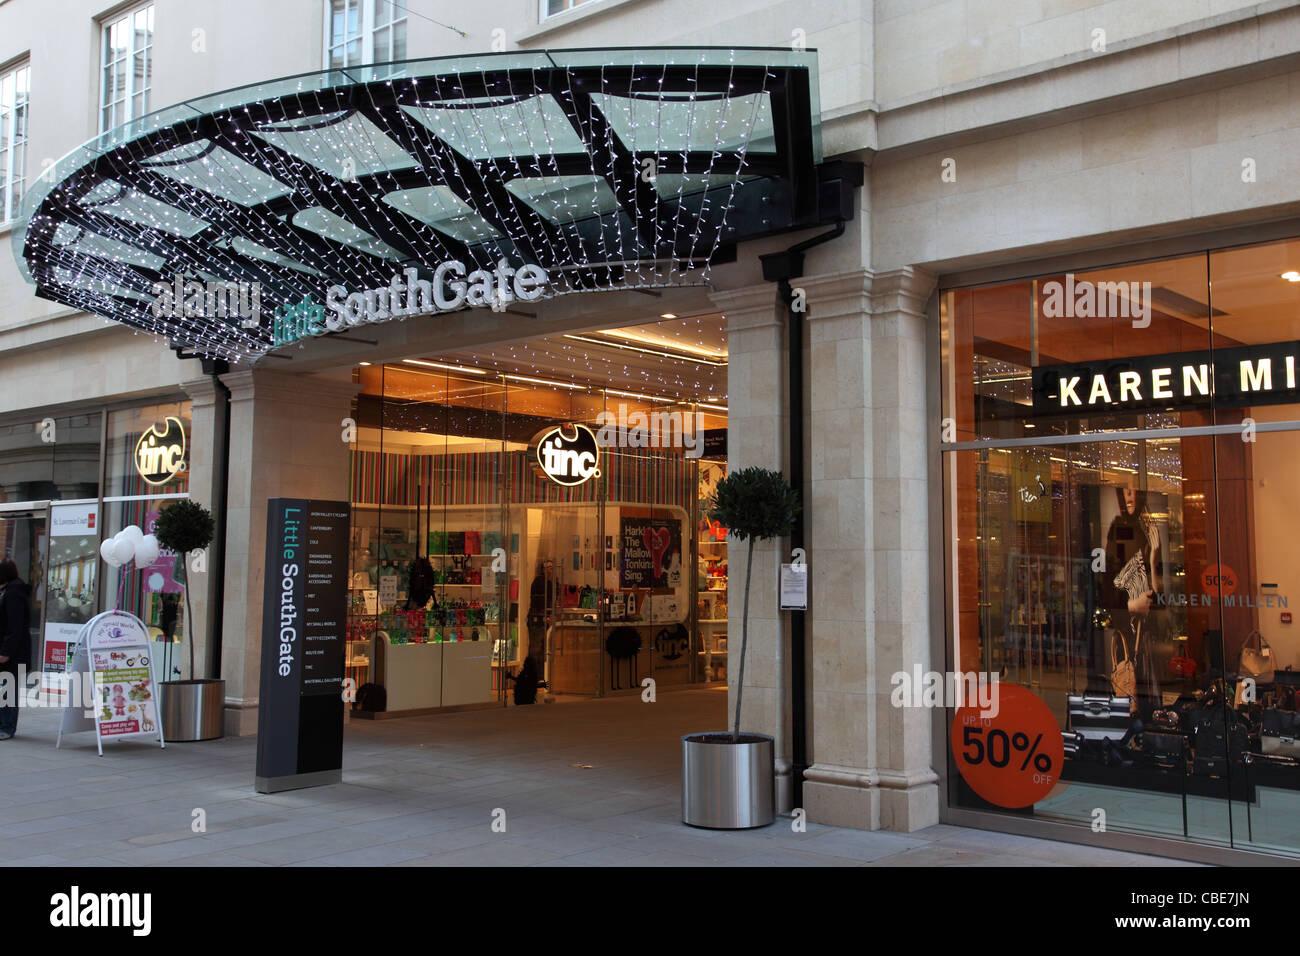 Little Southgate shopping precinct, Bath, England - Stock Image